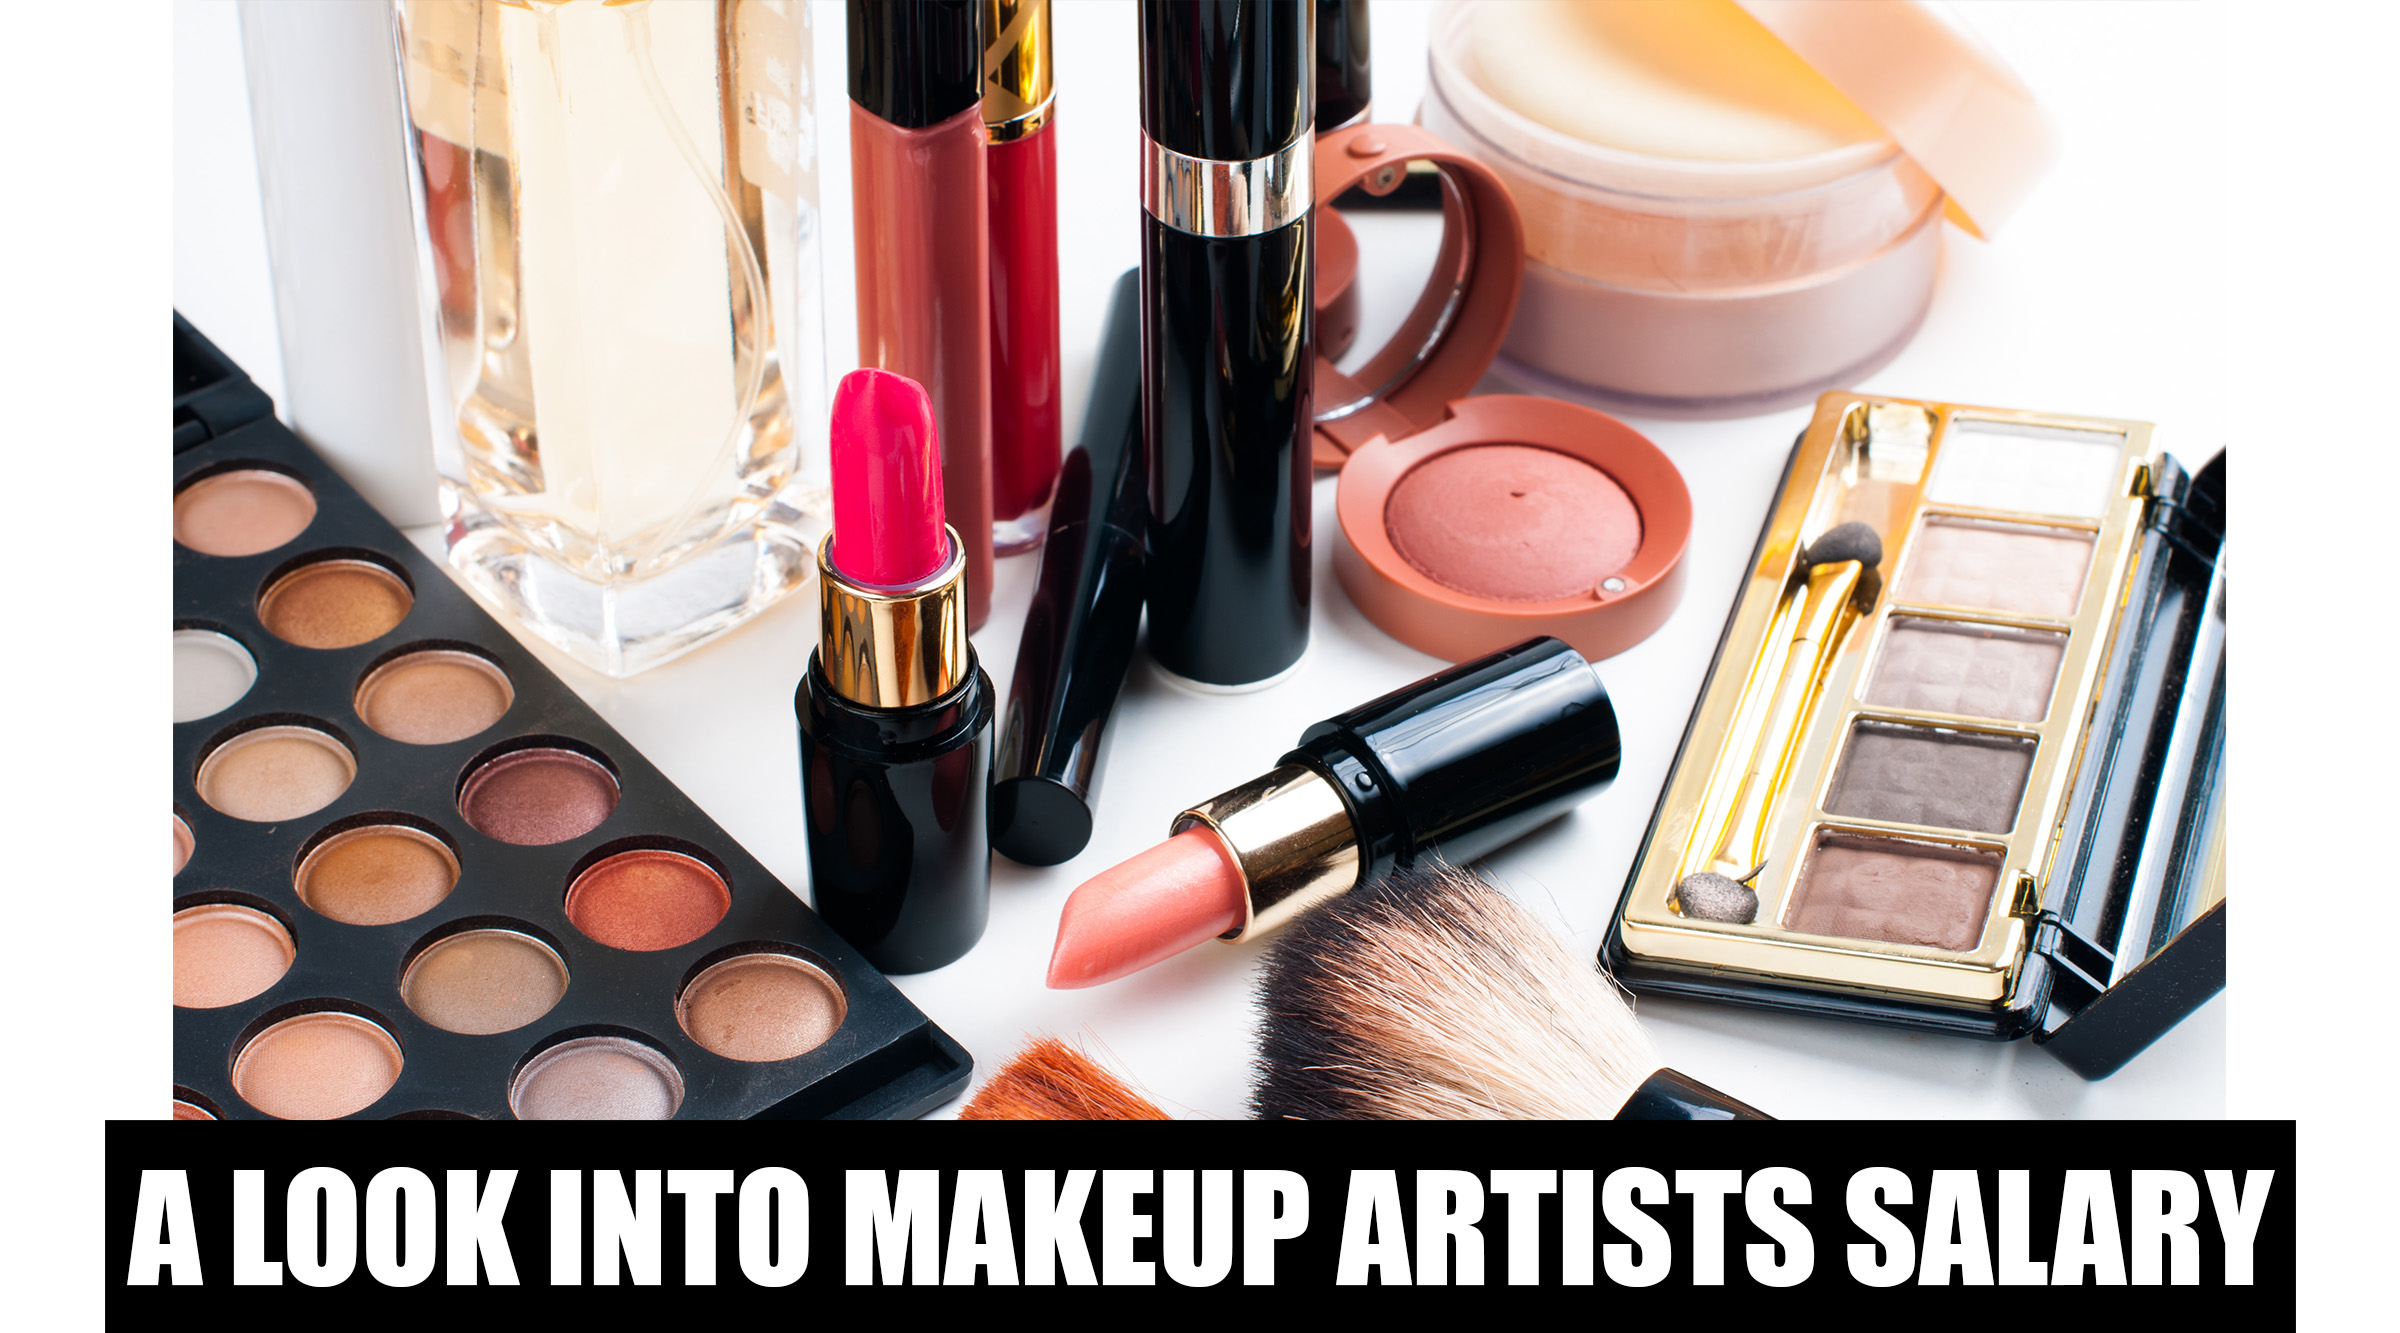 Average Makeup Artist Makes